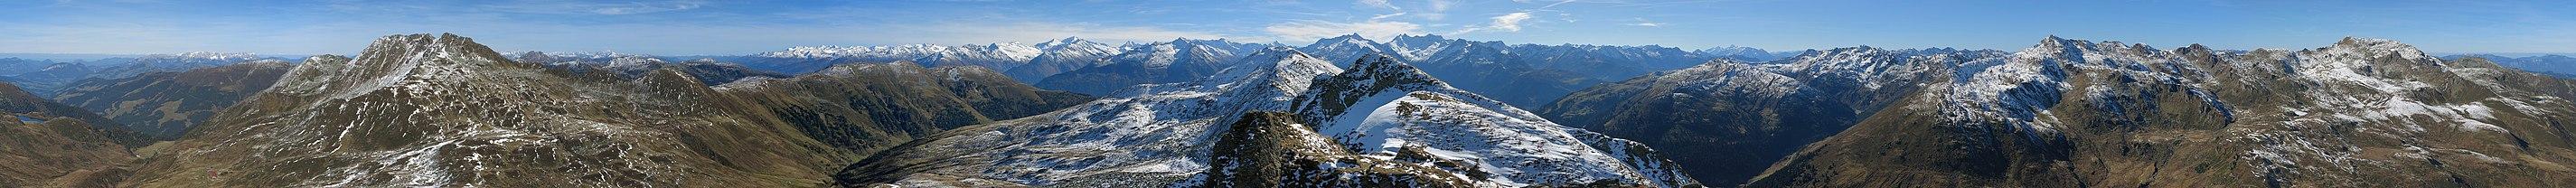 Panorama vom Tristkopf (Kitzbüheler Alpen).jpg